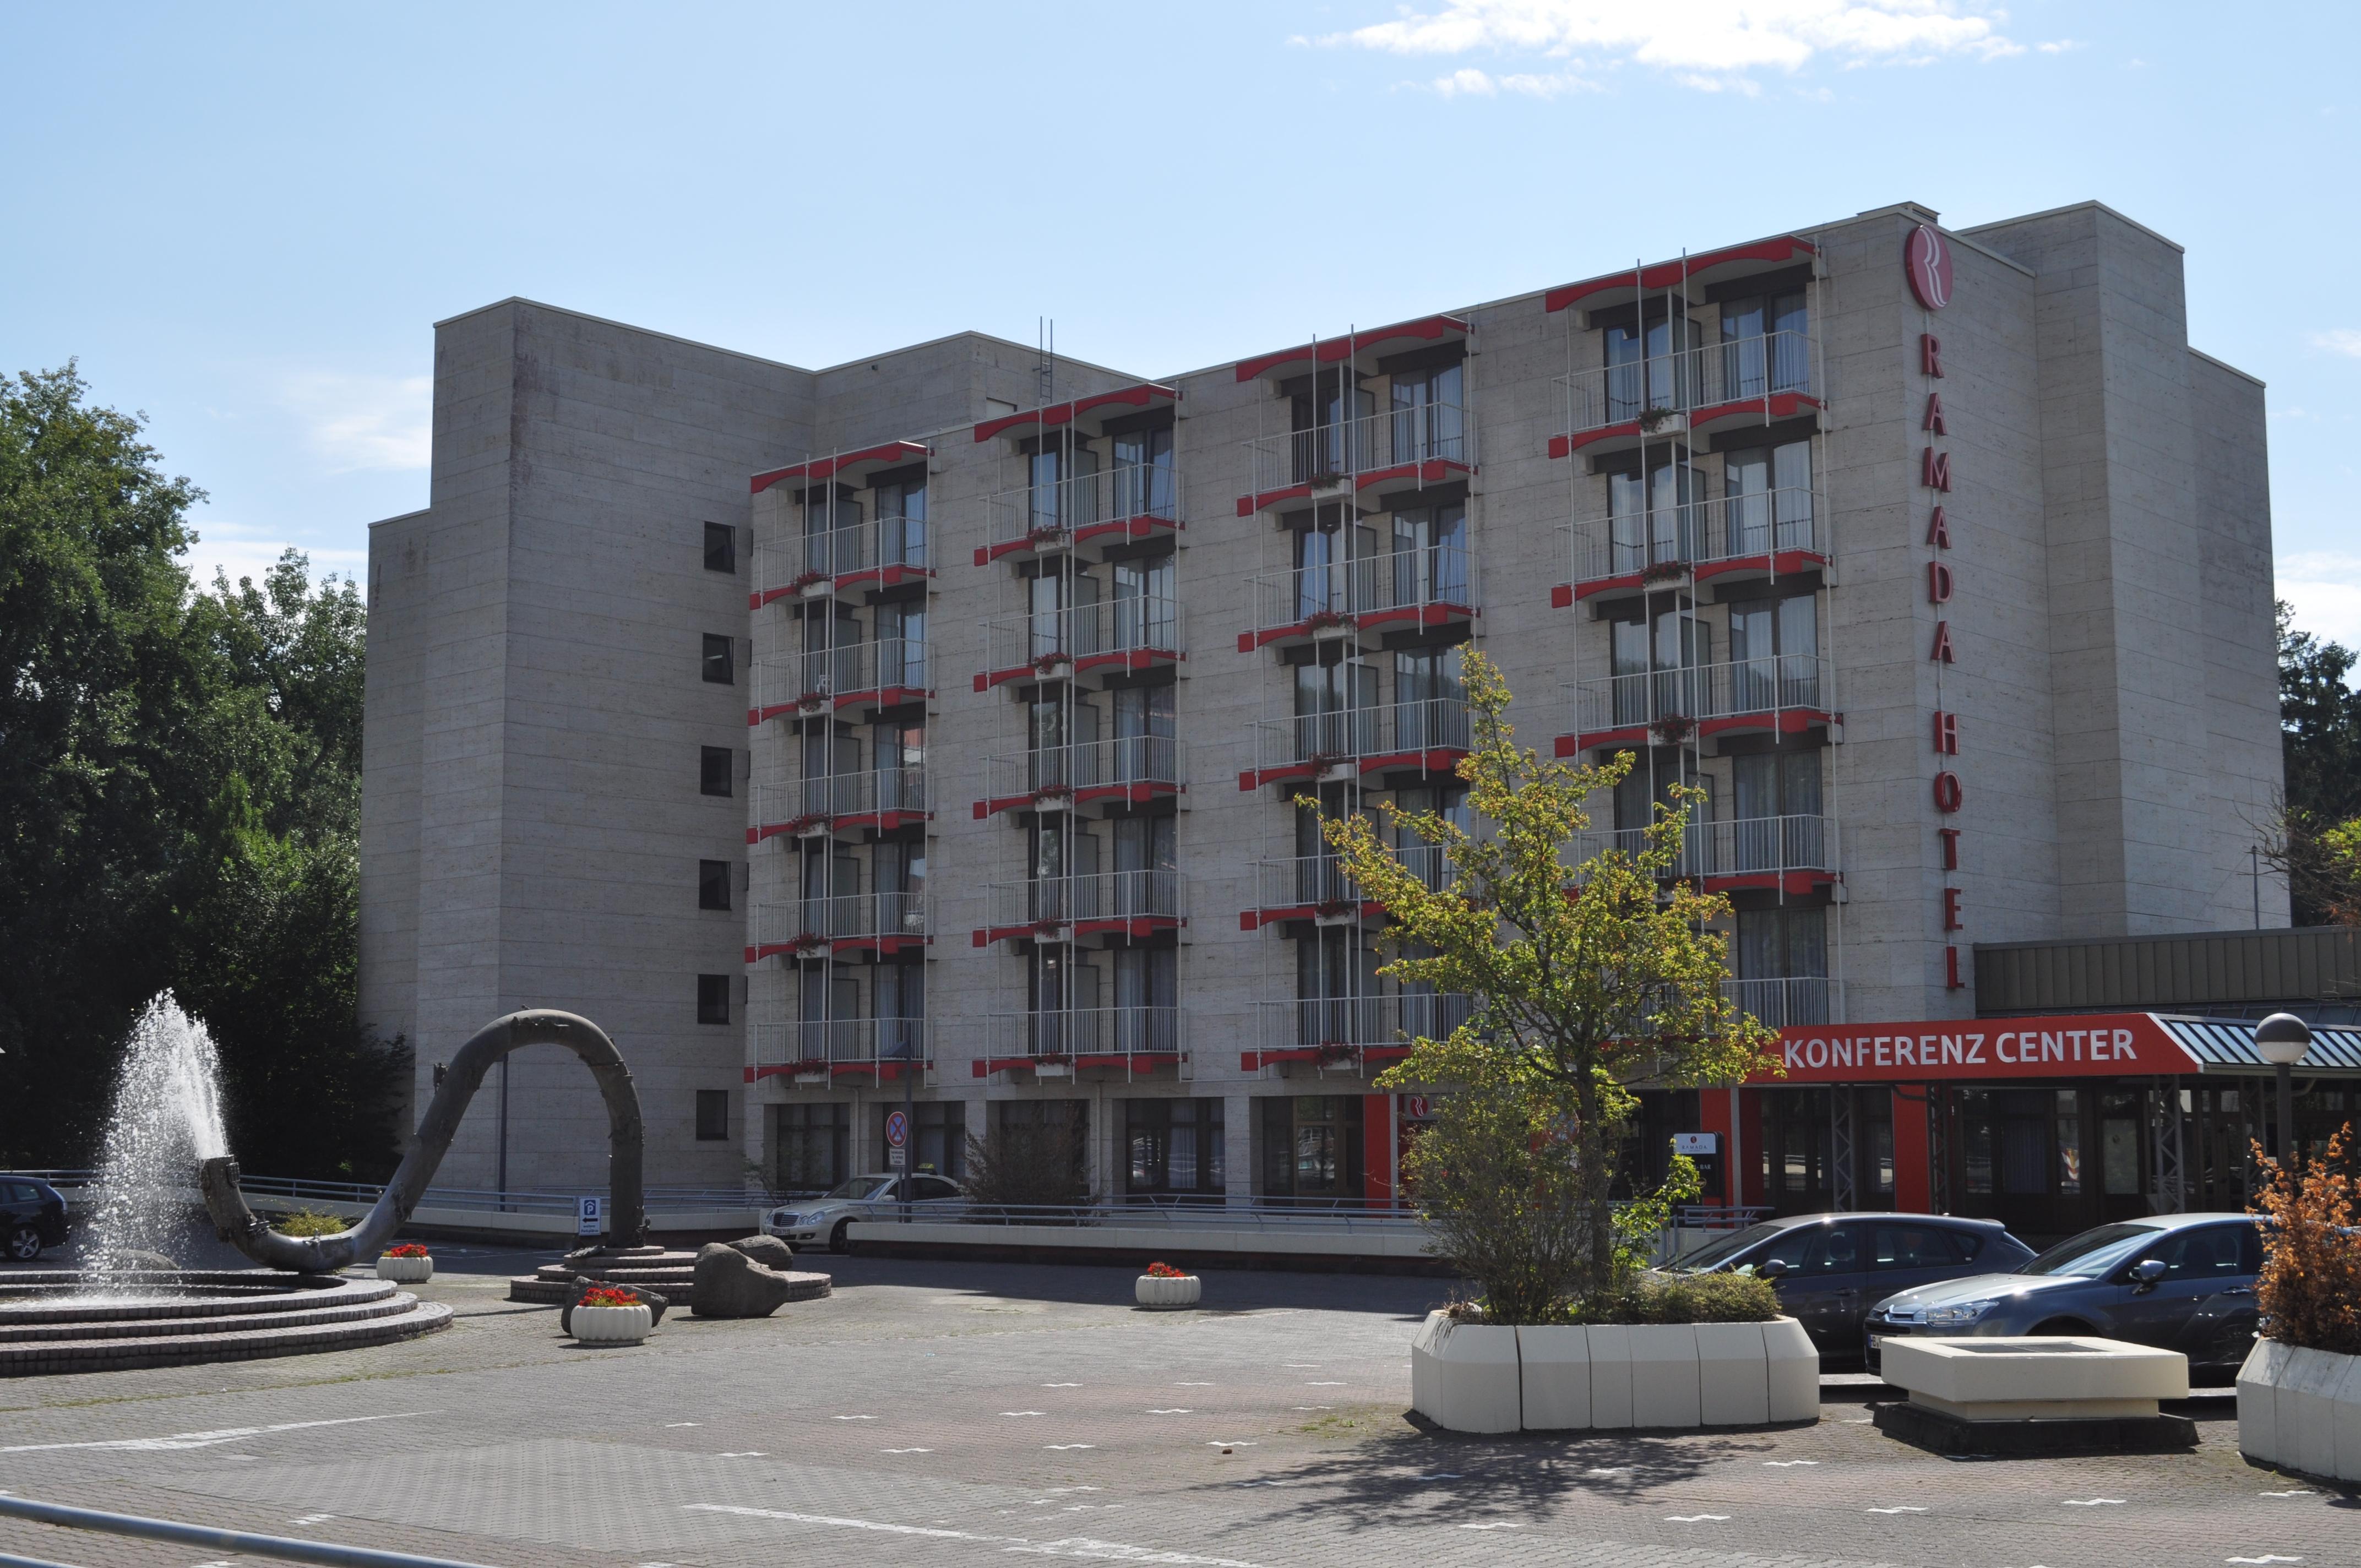 Ramada Hotel In Bad Soden